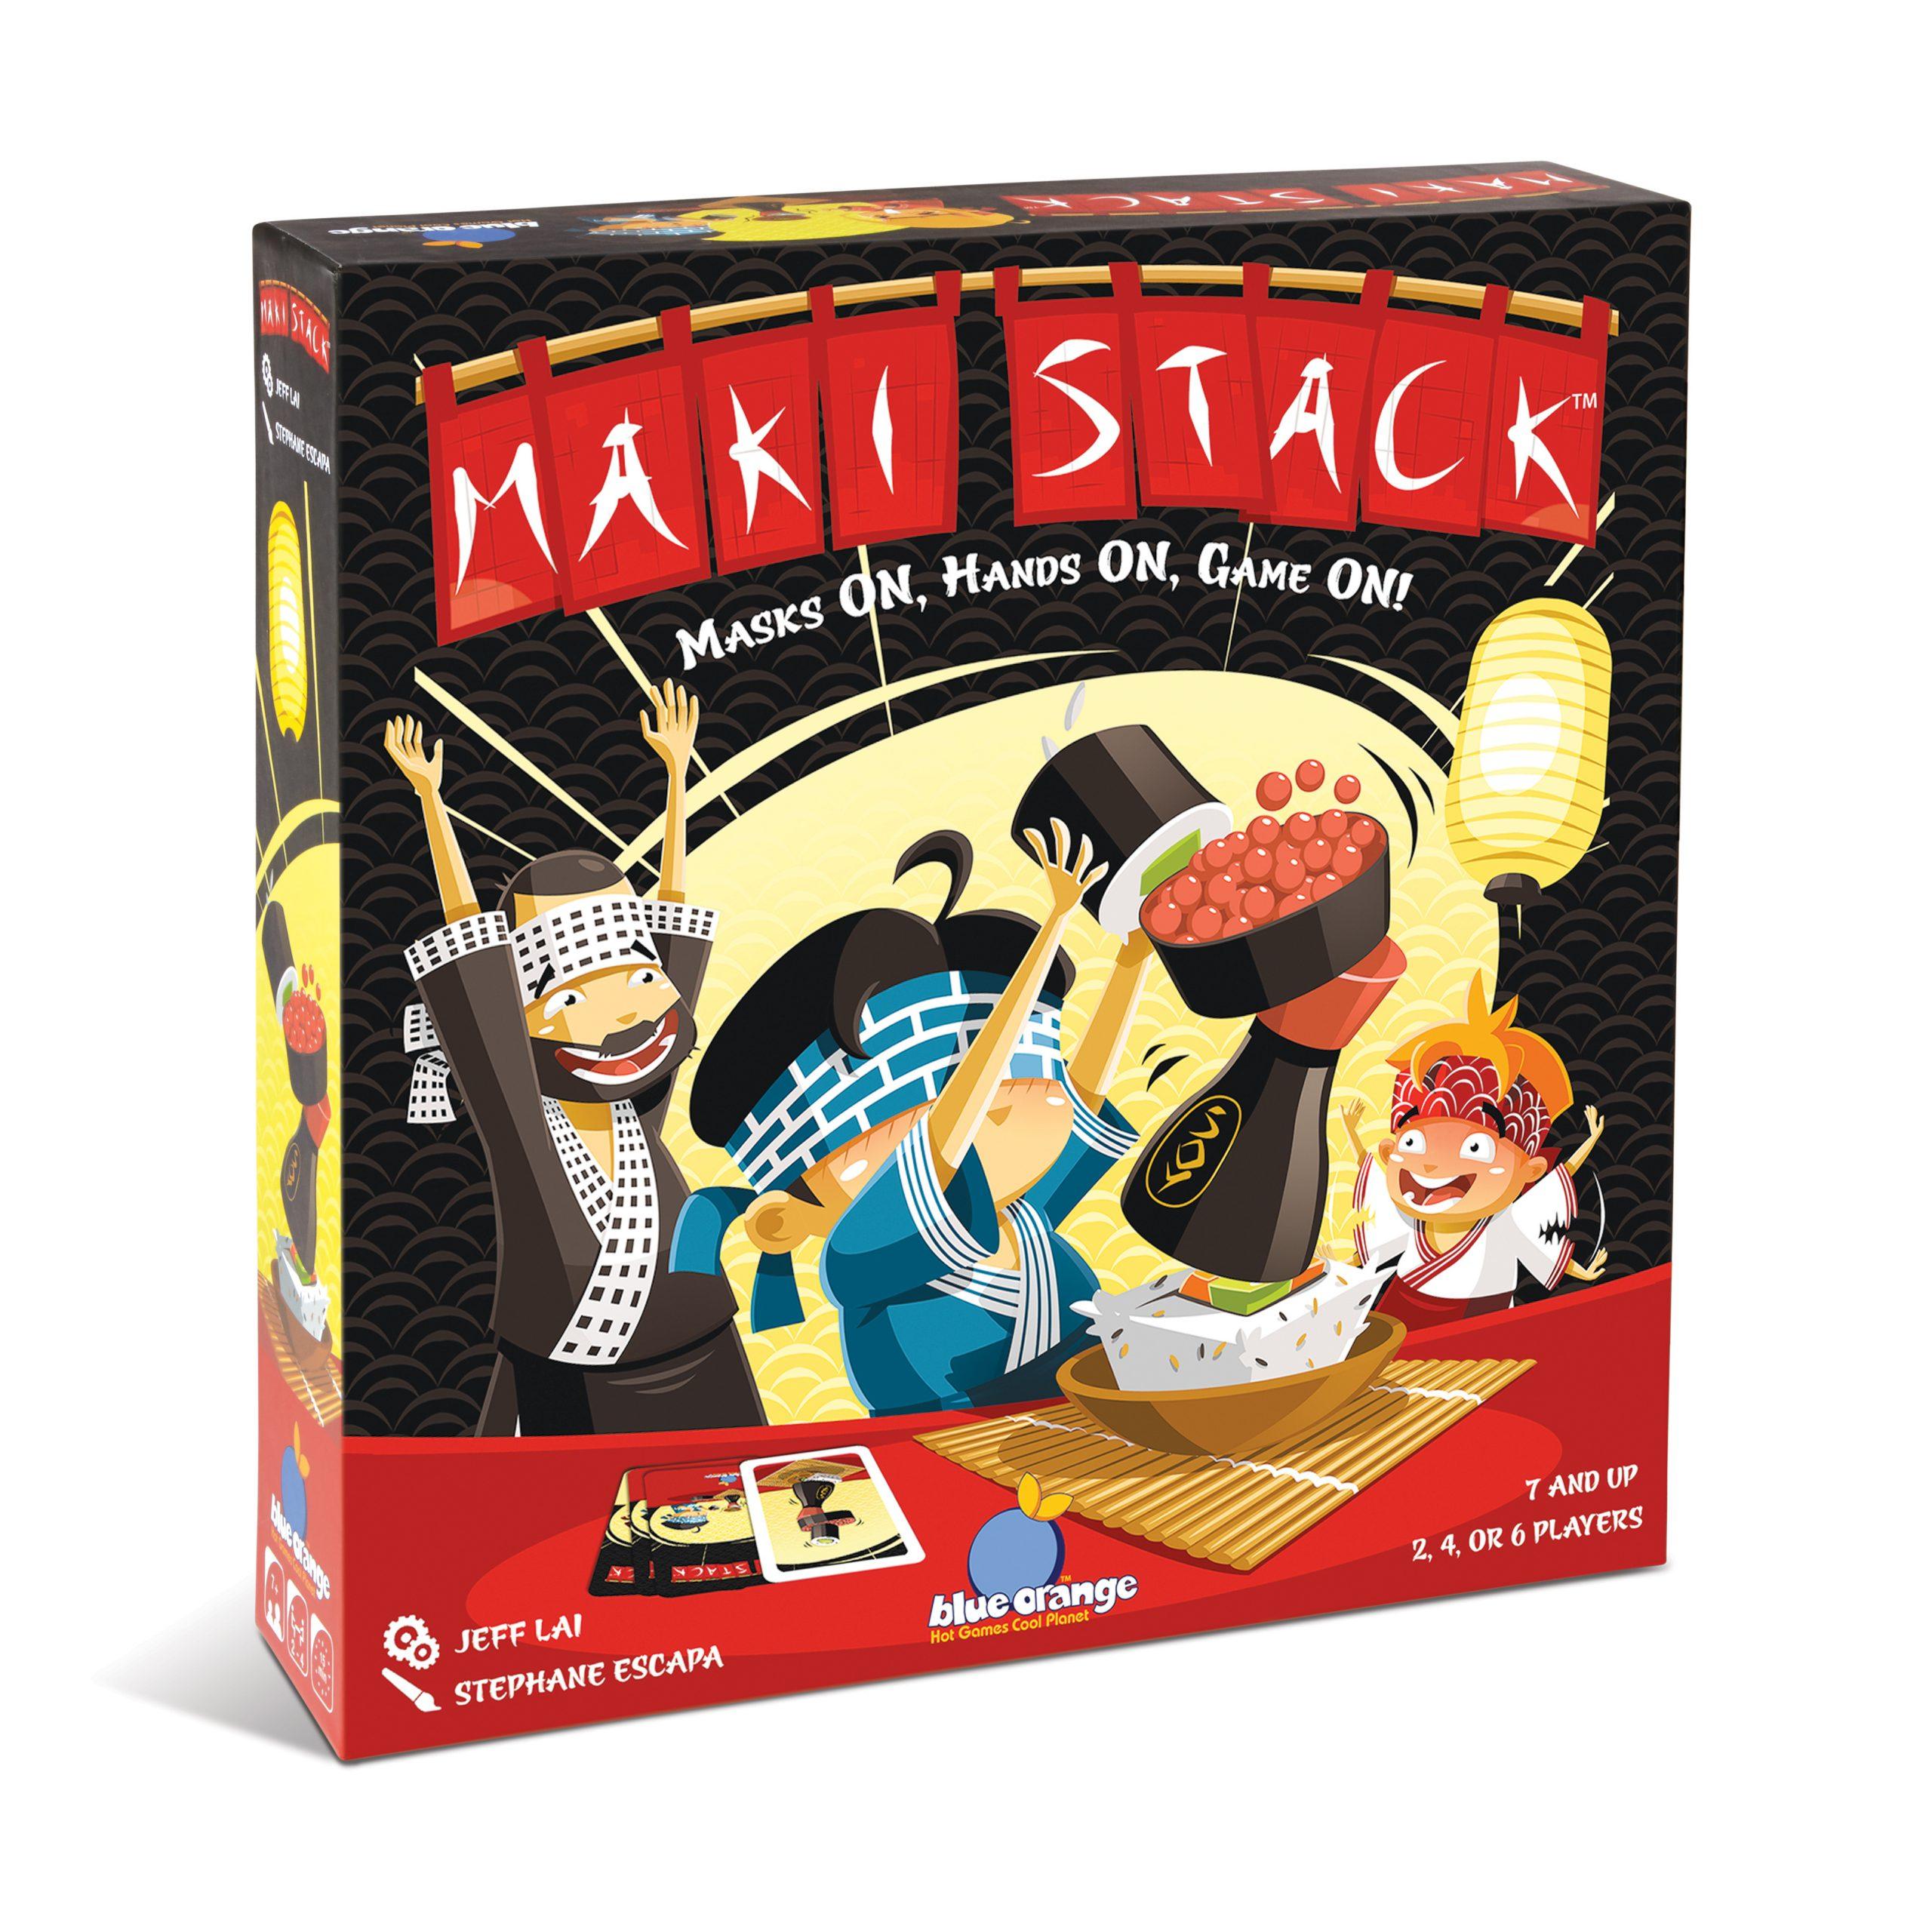 Maki Stack board game